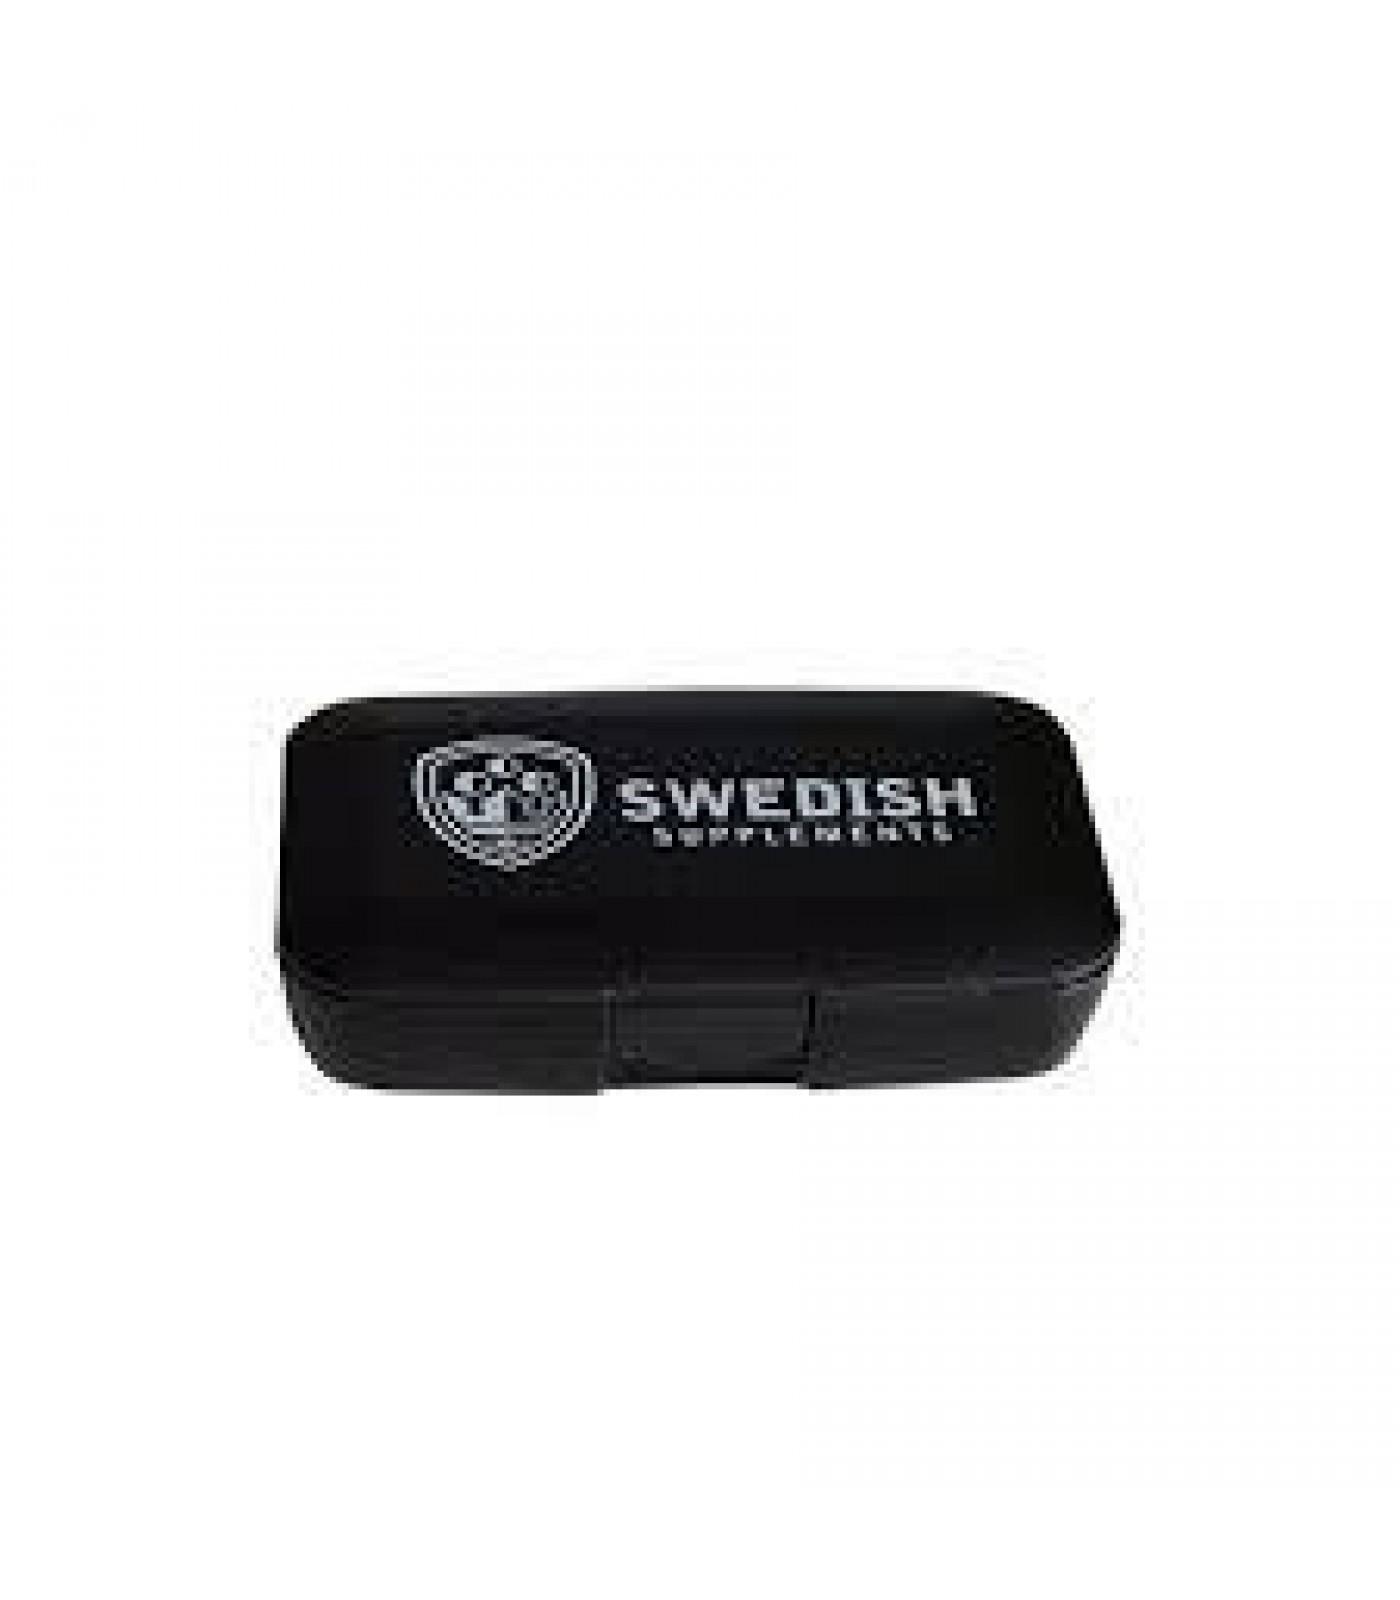 SWEDISH Supplements - SWEDISH Pill box